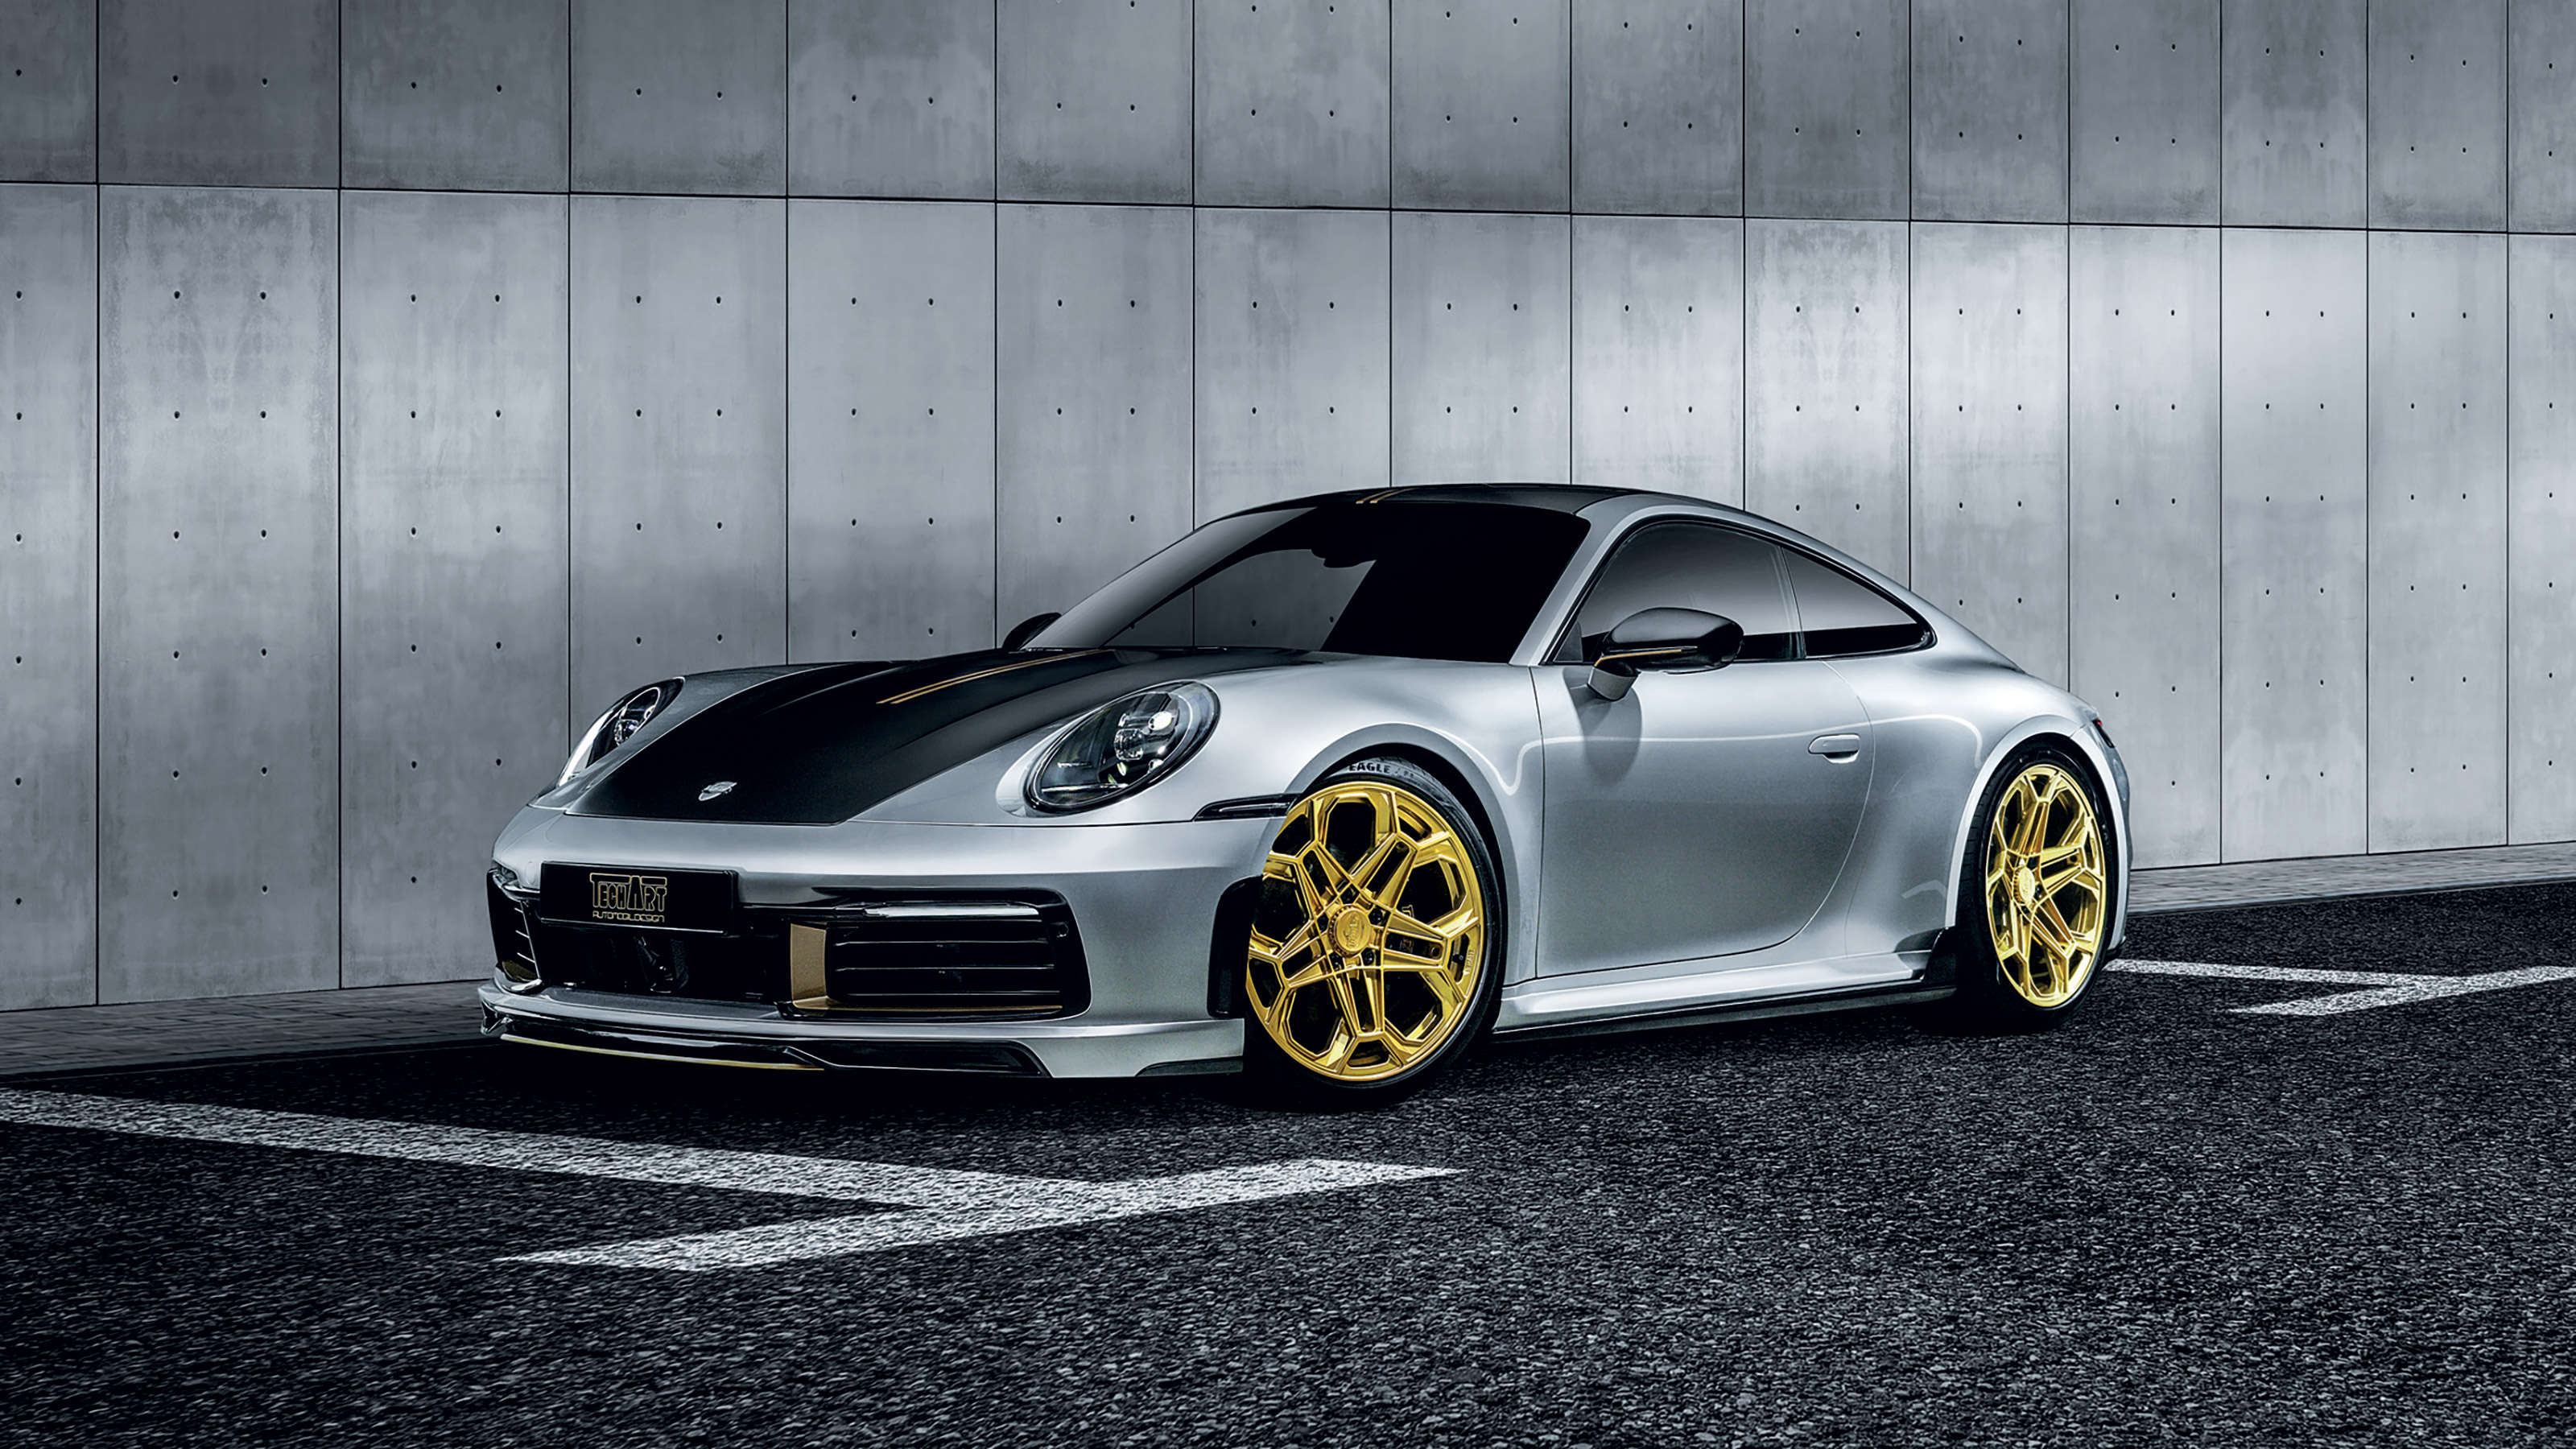 Audi Tt For Sale >> Techart 992 Porsche 911 Carrera 4S boasts more power than ...